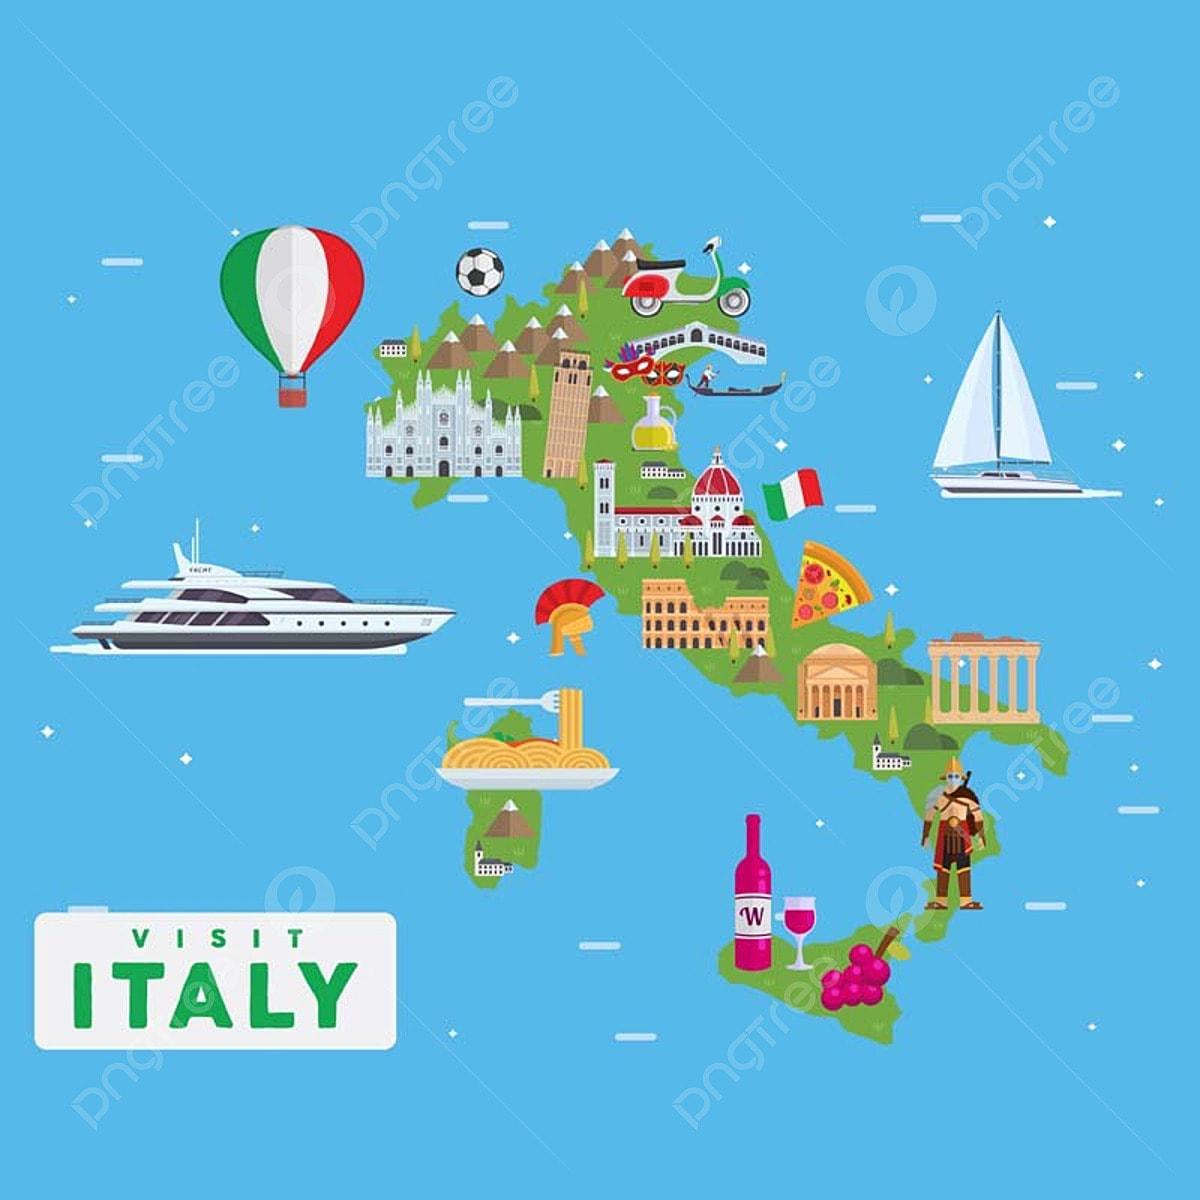 Italy Famous Tourist Destination Map Illustration Landmark